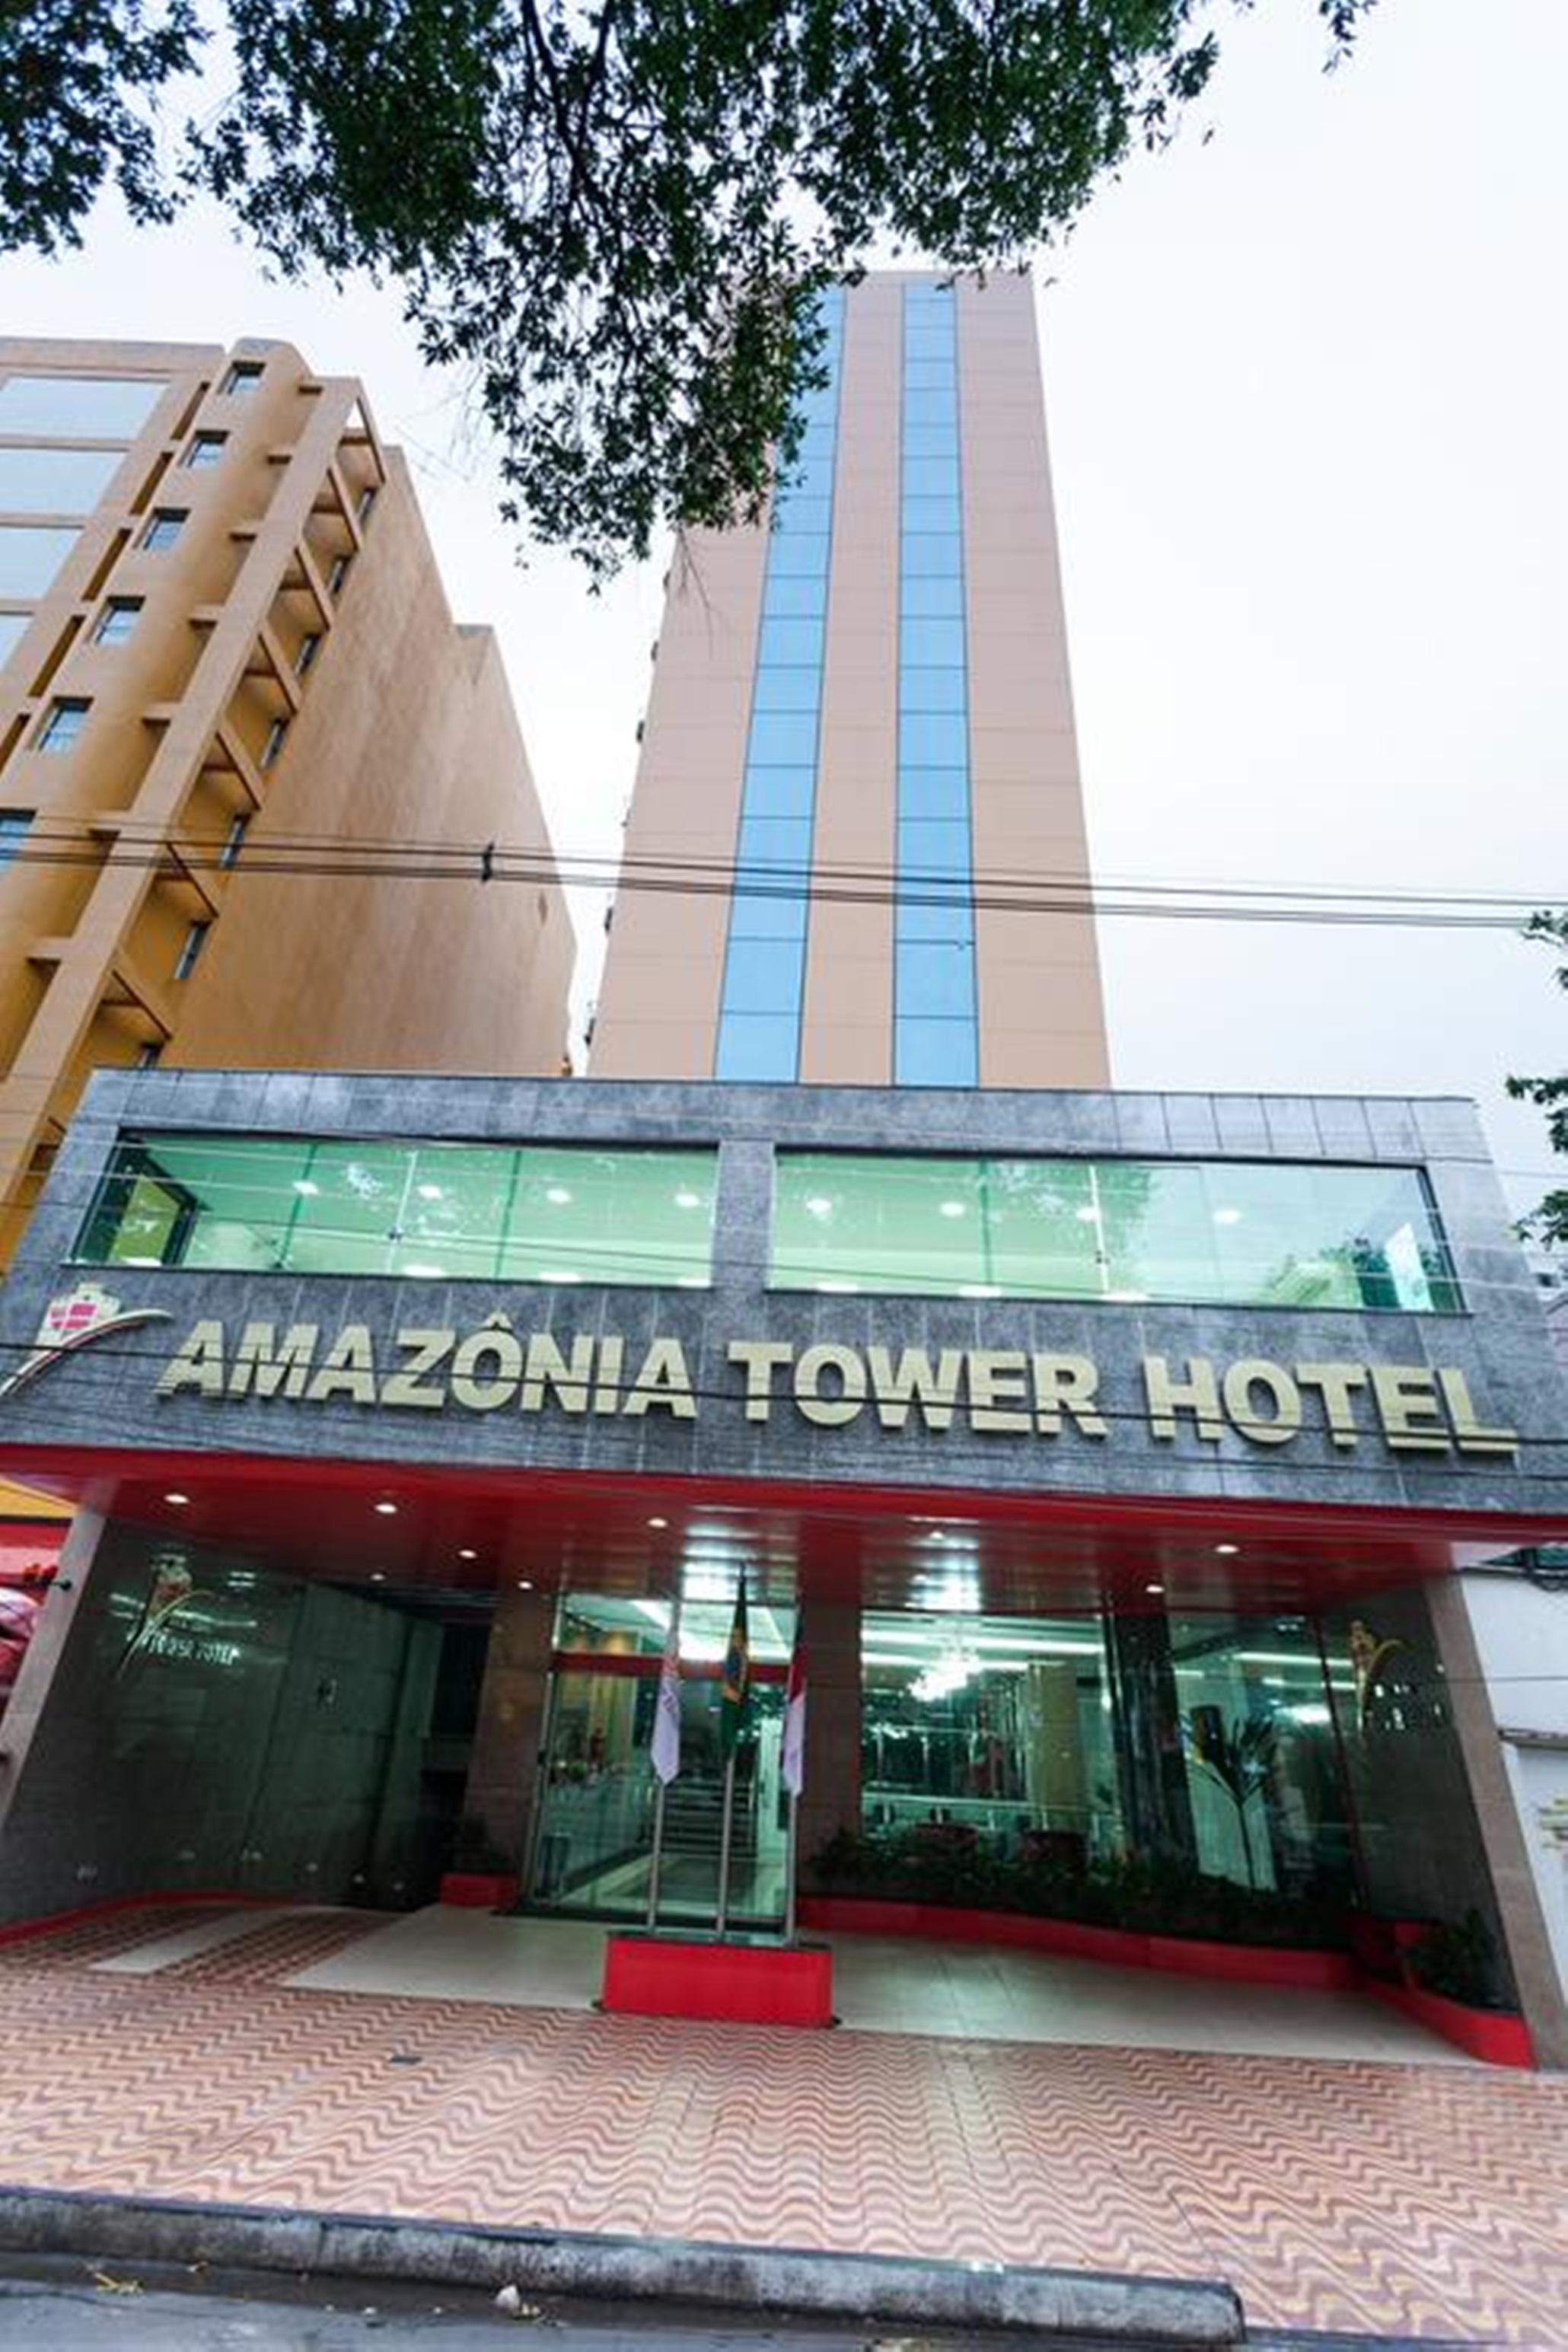 Amazonia Tower Hotel, Maués